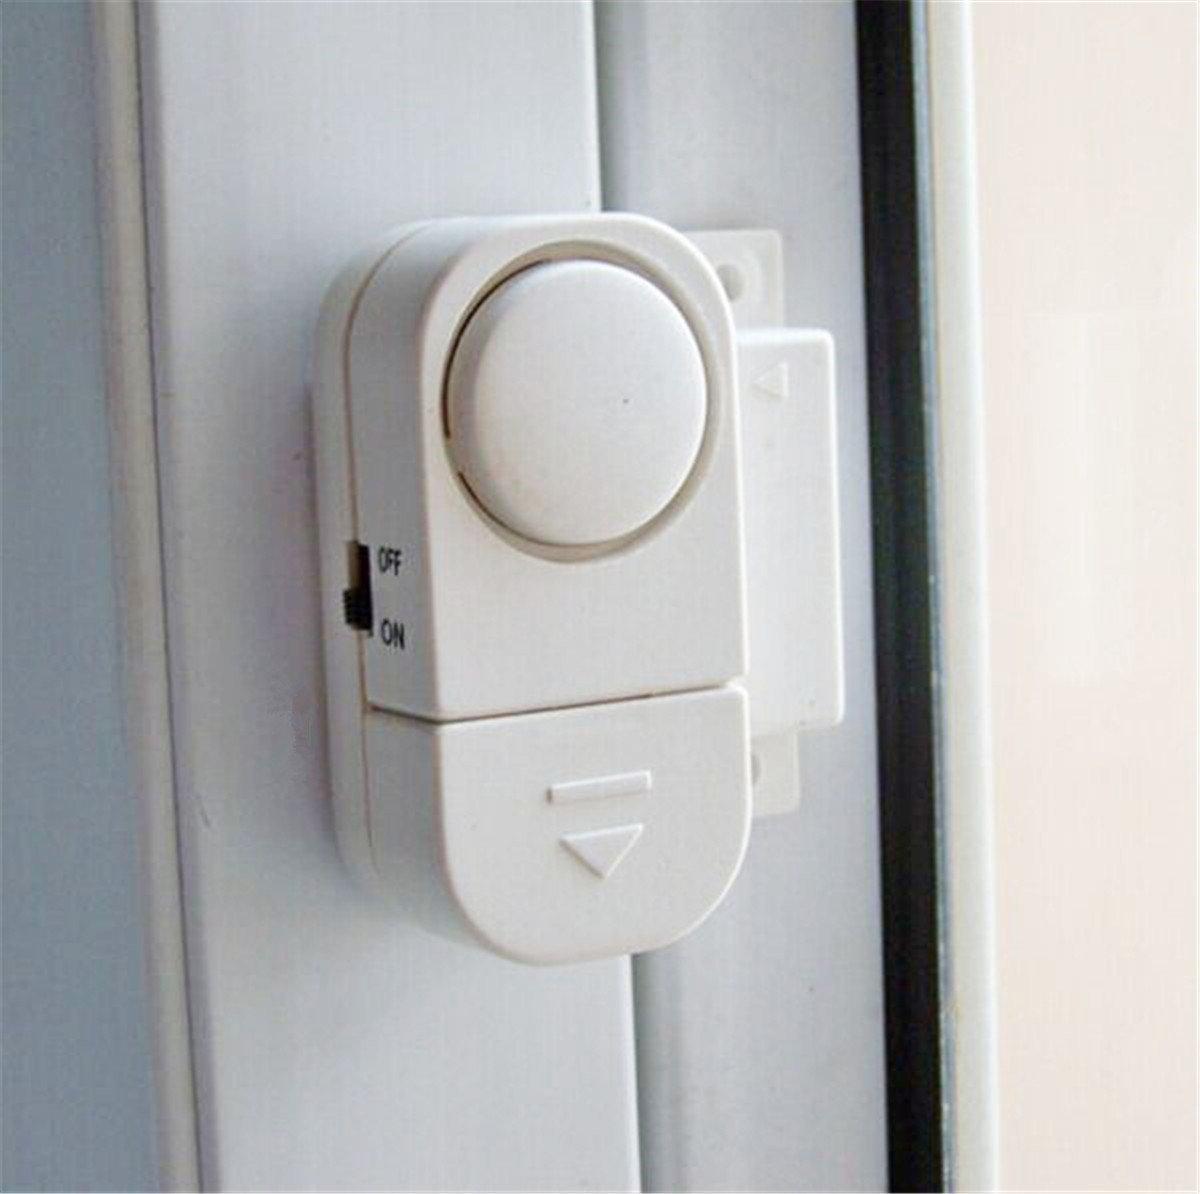 ... de seguridad Sensor magnético - Ventana Cristal vibración alarma antirrobo Seguridad para casas, coches, caravanas, caravanas, cobertizos - inalámbrica ...